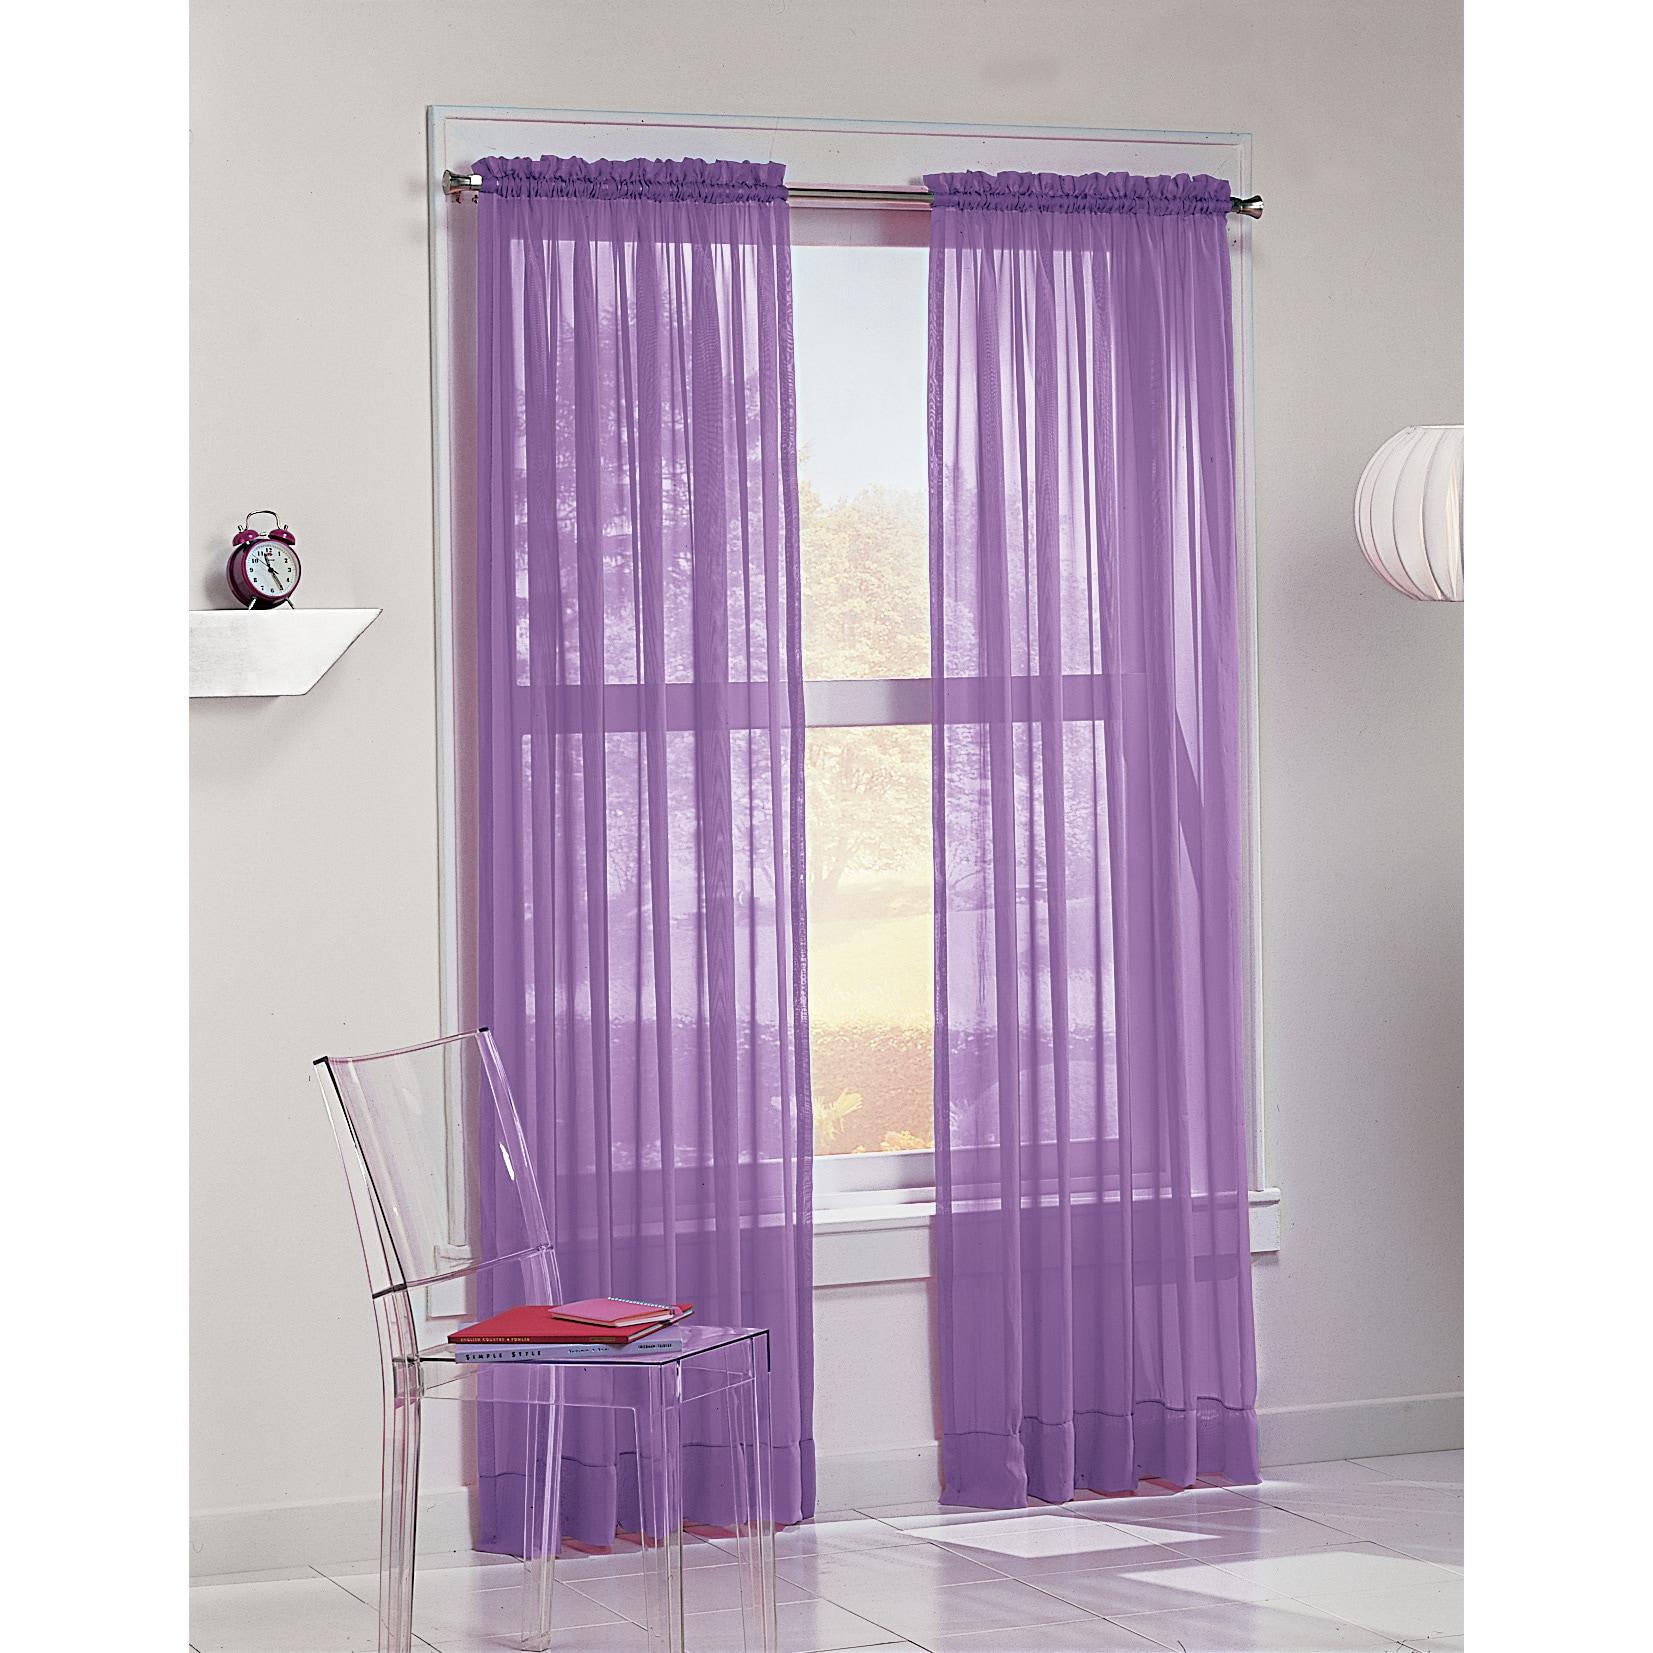 No. 918 Calypso 63-inch Curtain Panel (Purple), Size 63 I...